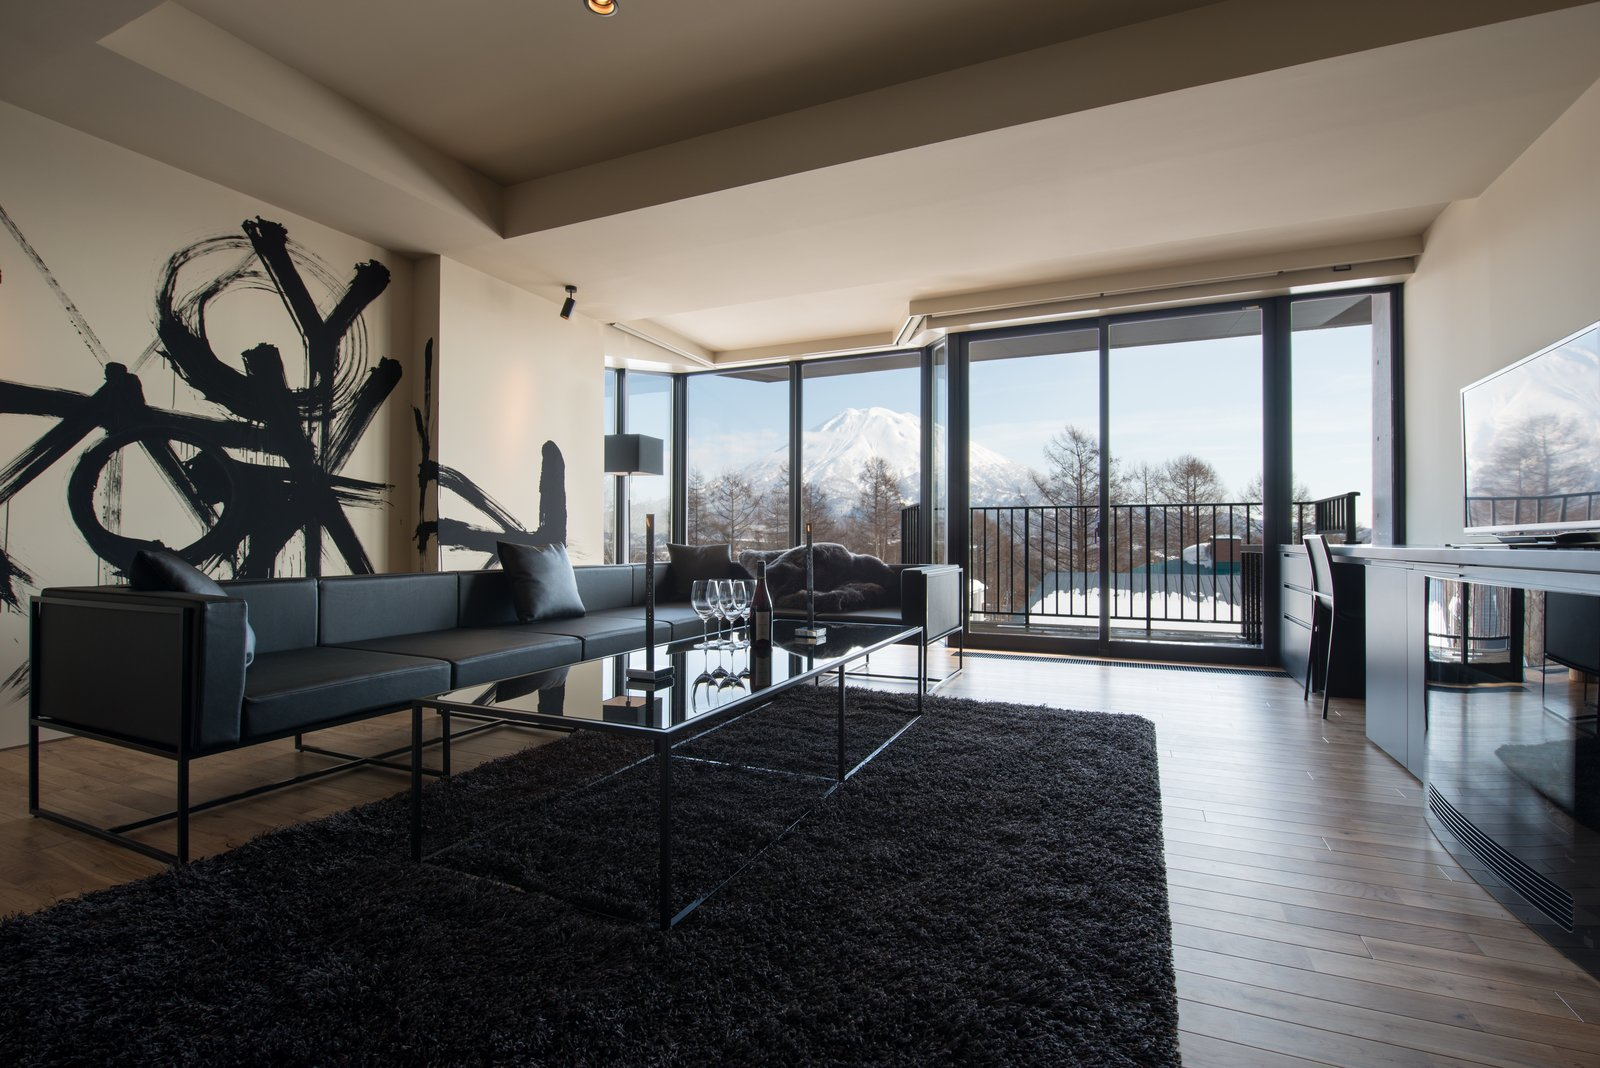 Muse niseko 301 3 bedroom apartment large